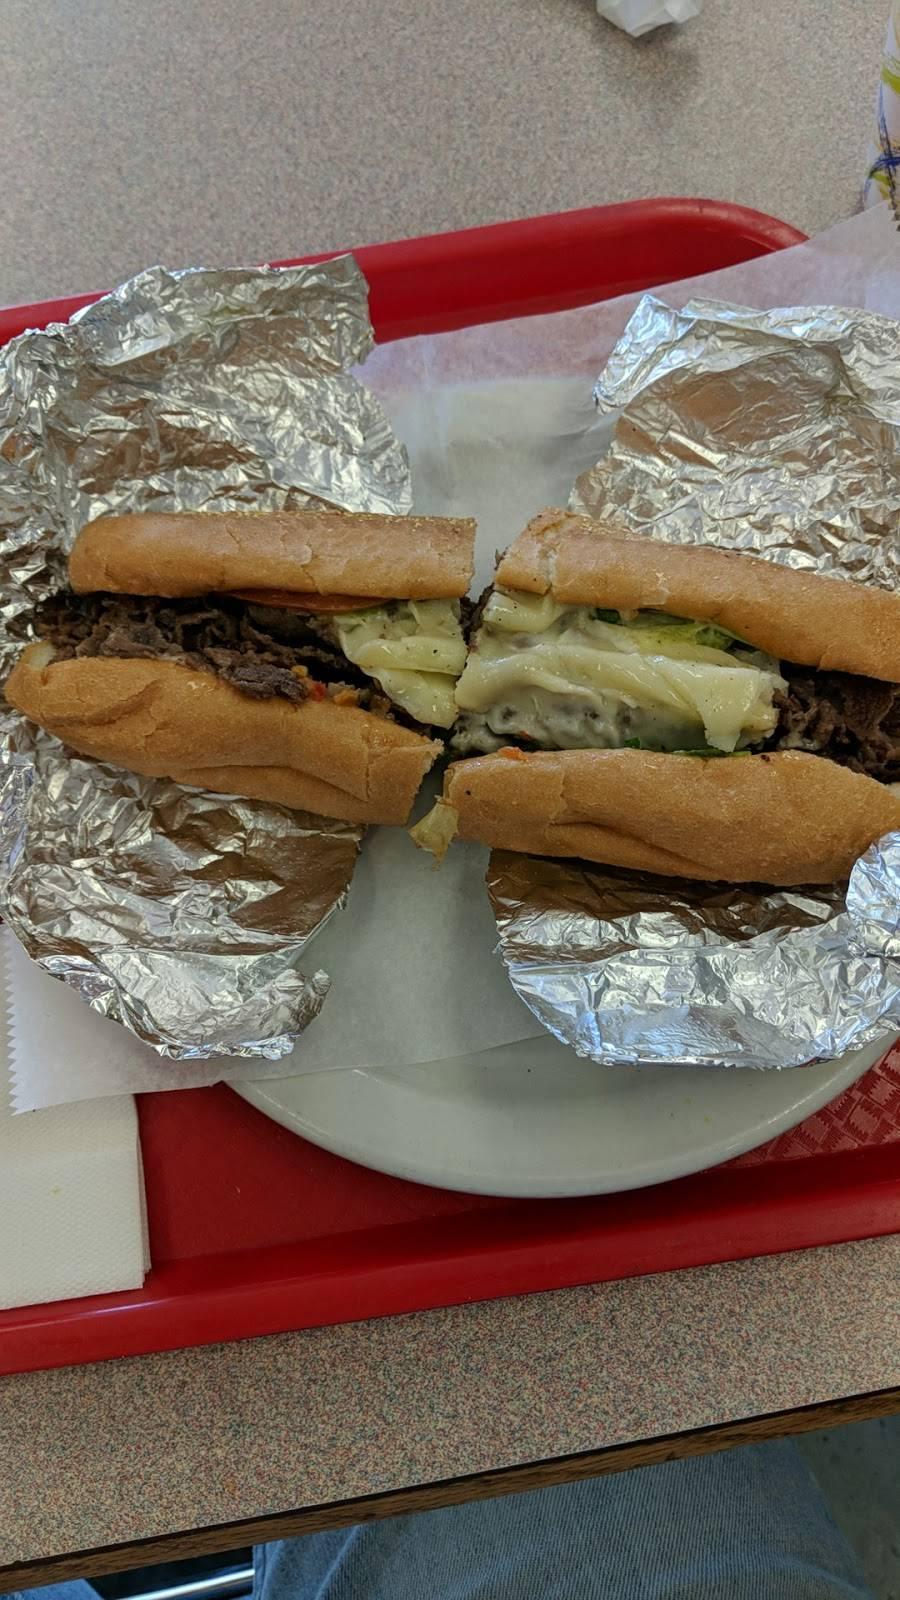 Antonios Pizza Subs & Pasta & Bakery | bakery | 742 Cady Dr, Fort Washington, MD 20744, USA | 3012489780 OR +1 301-248-9780